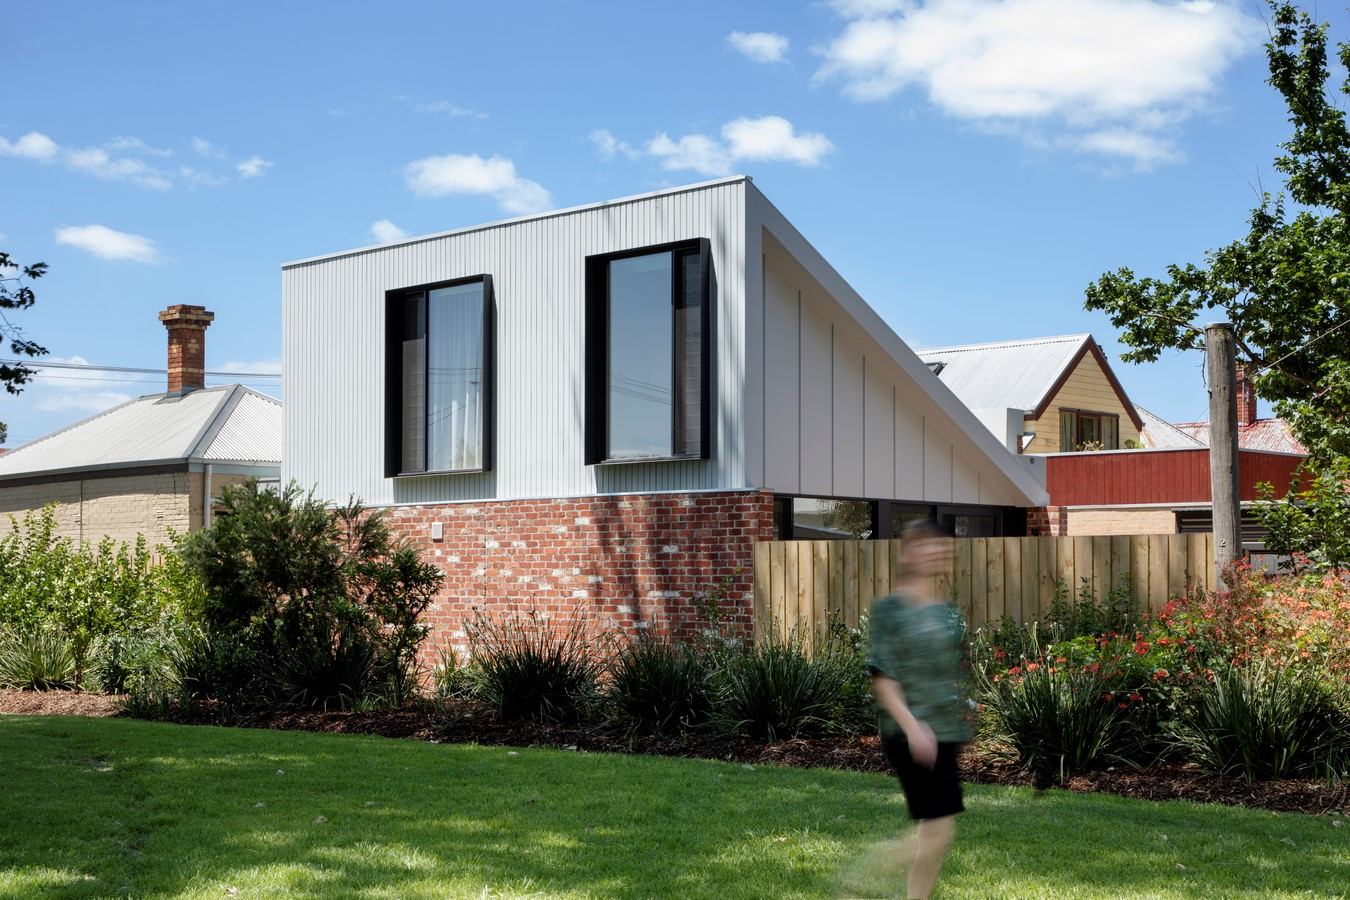 5081 Gold Street Residence by Sarah Kahn Architect : Sheet 3